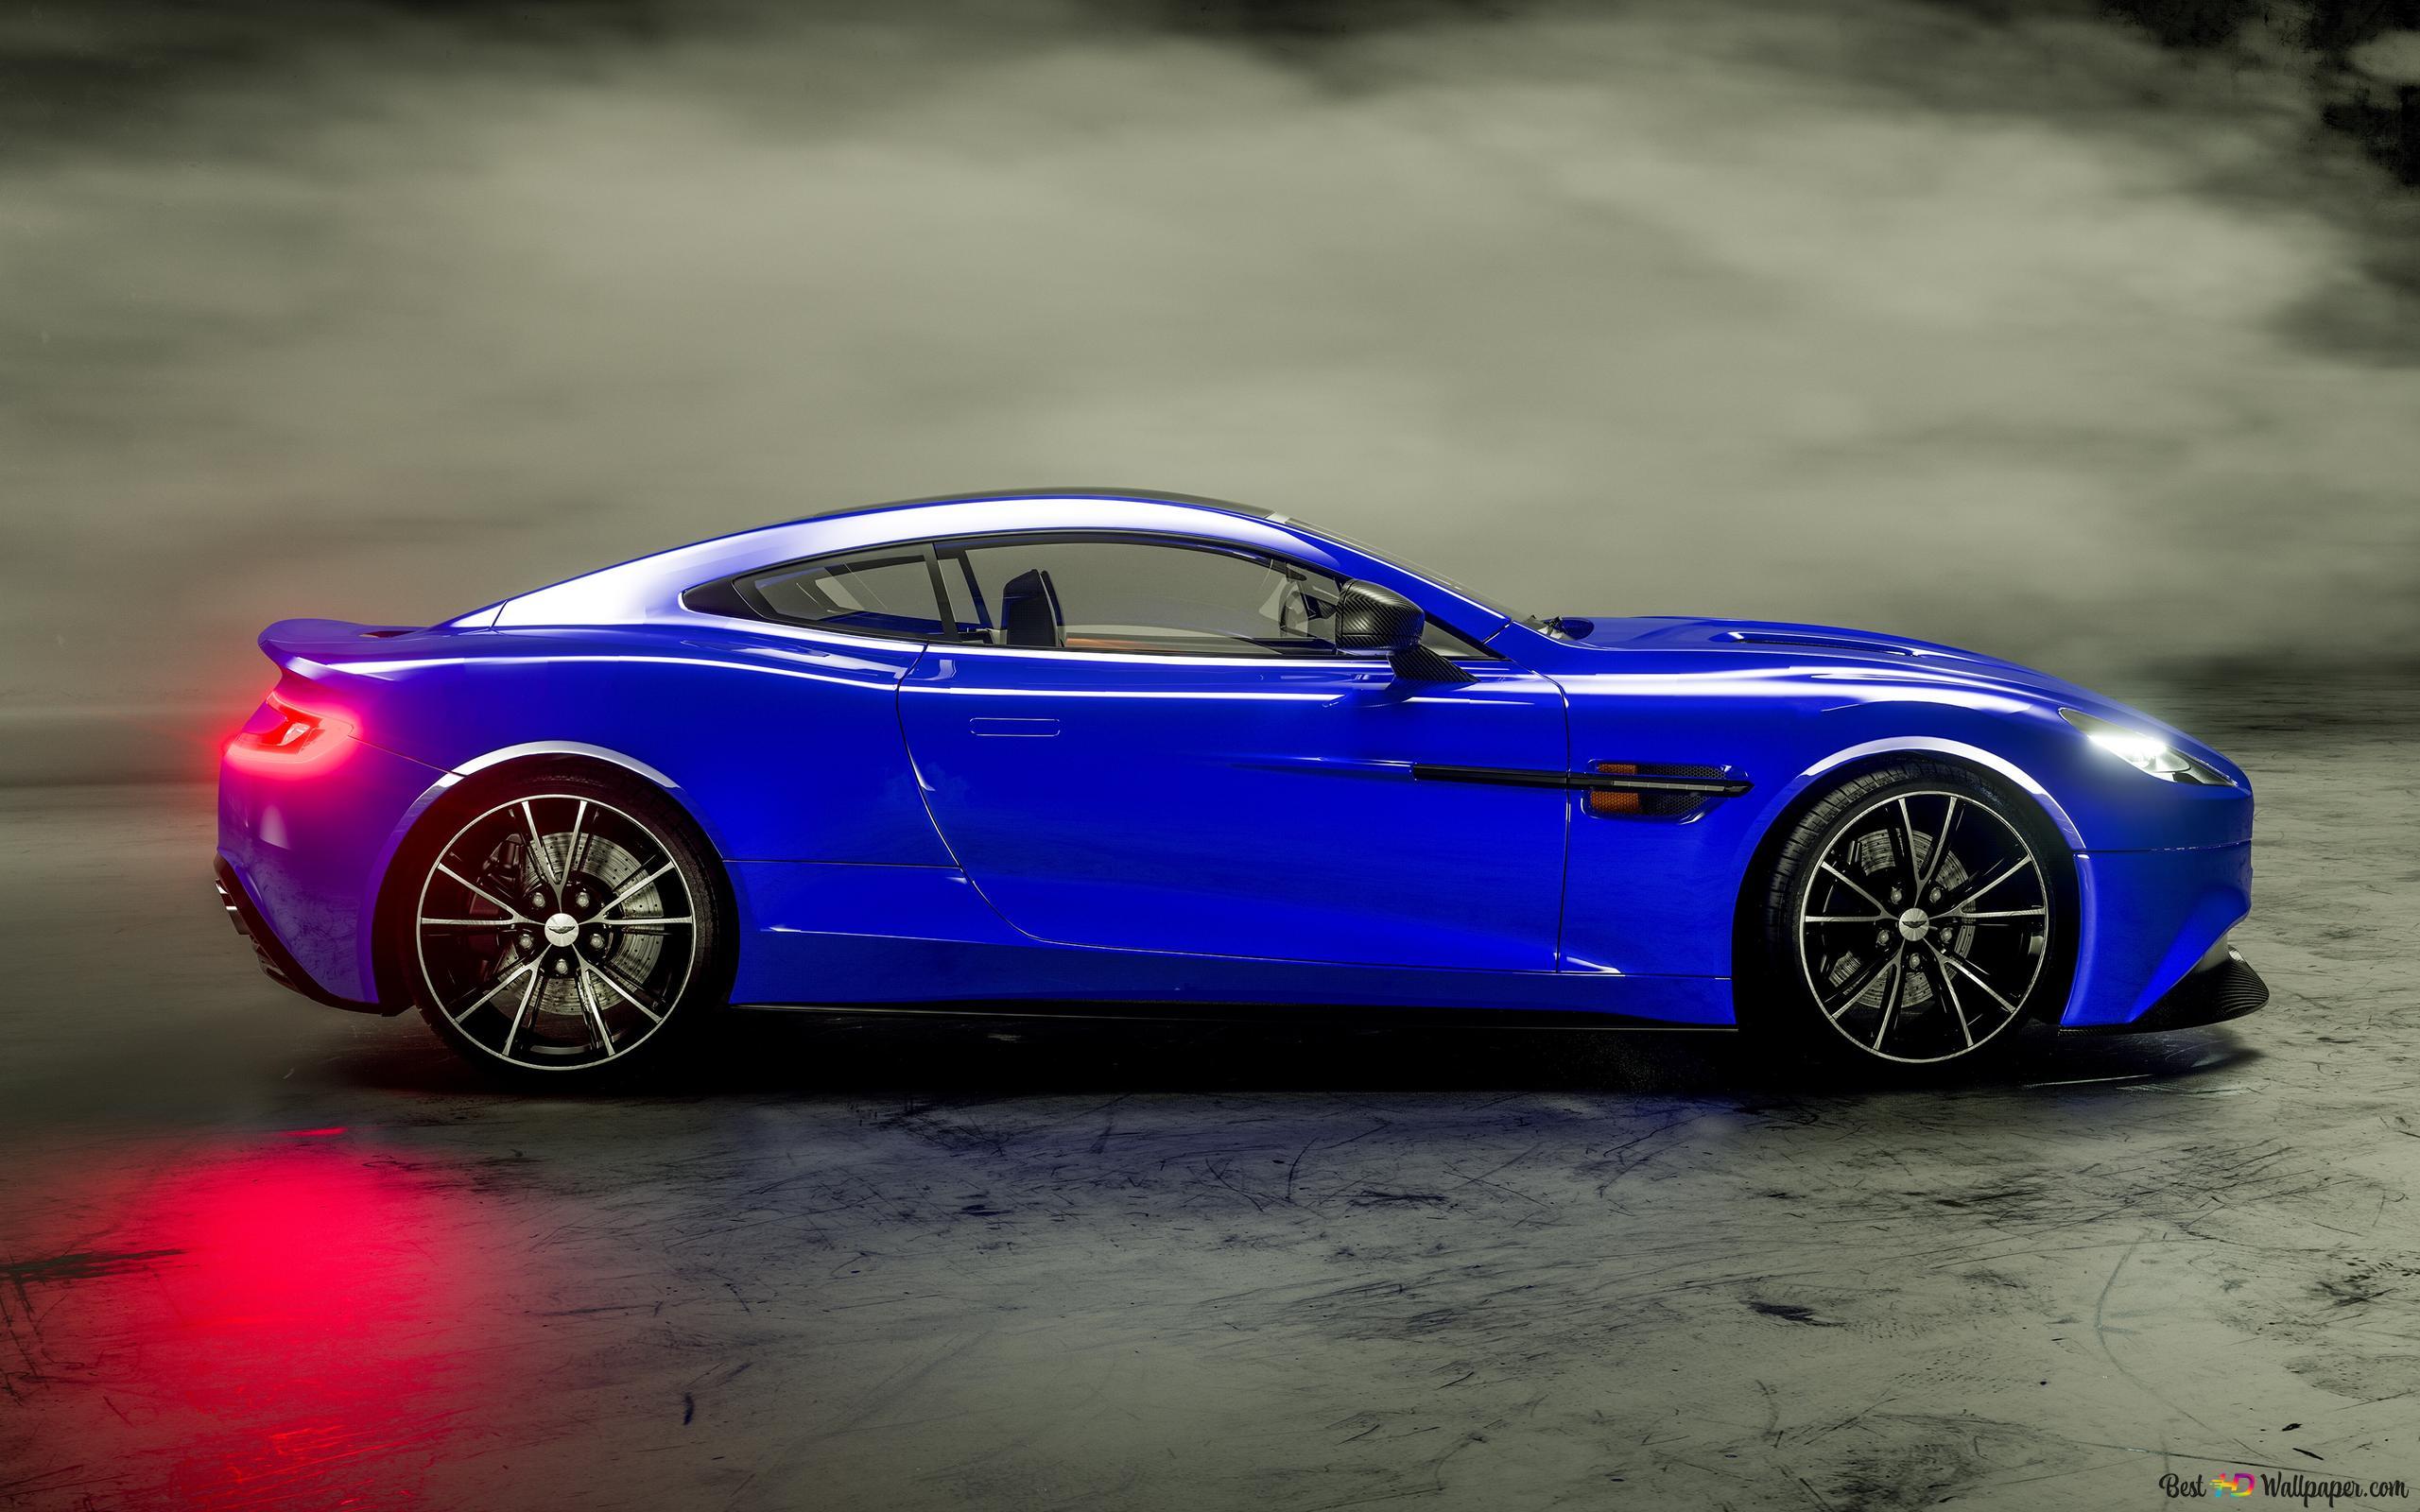 Blue Aston Martin Vanquish Hd Wallpaper Download